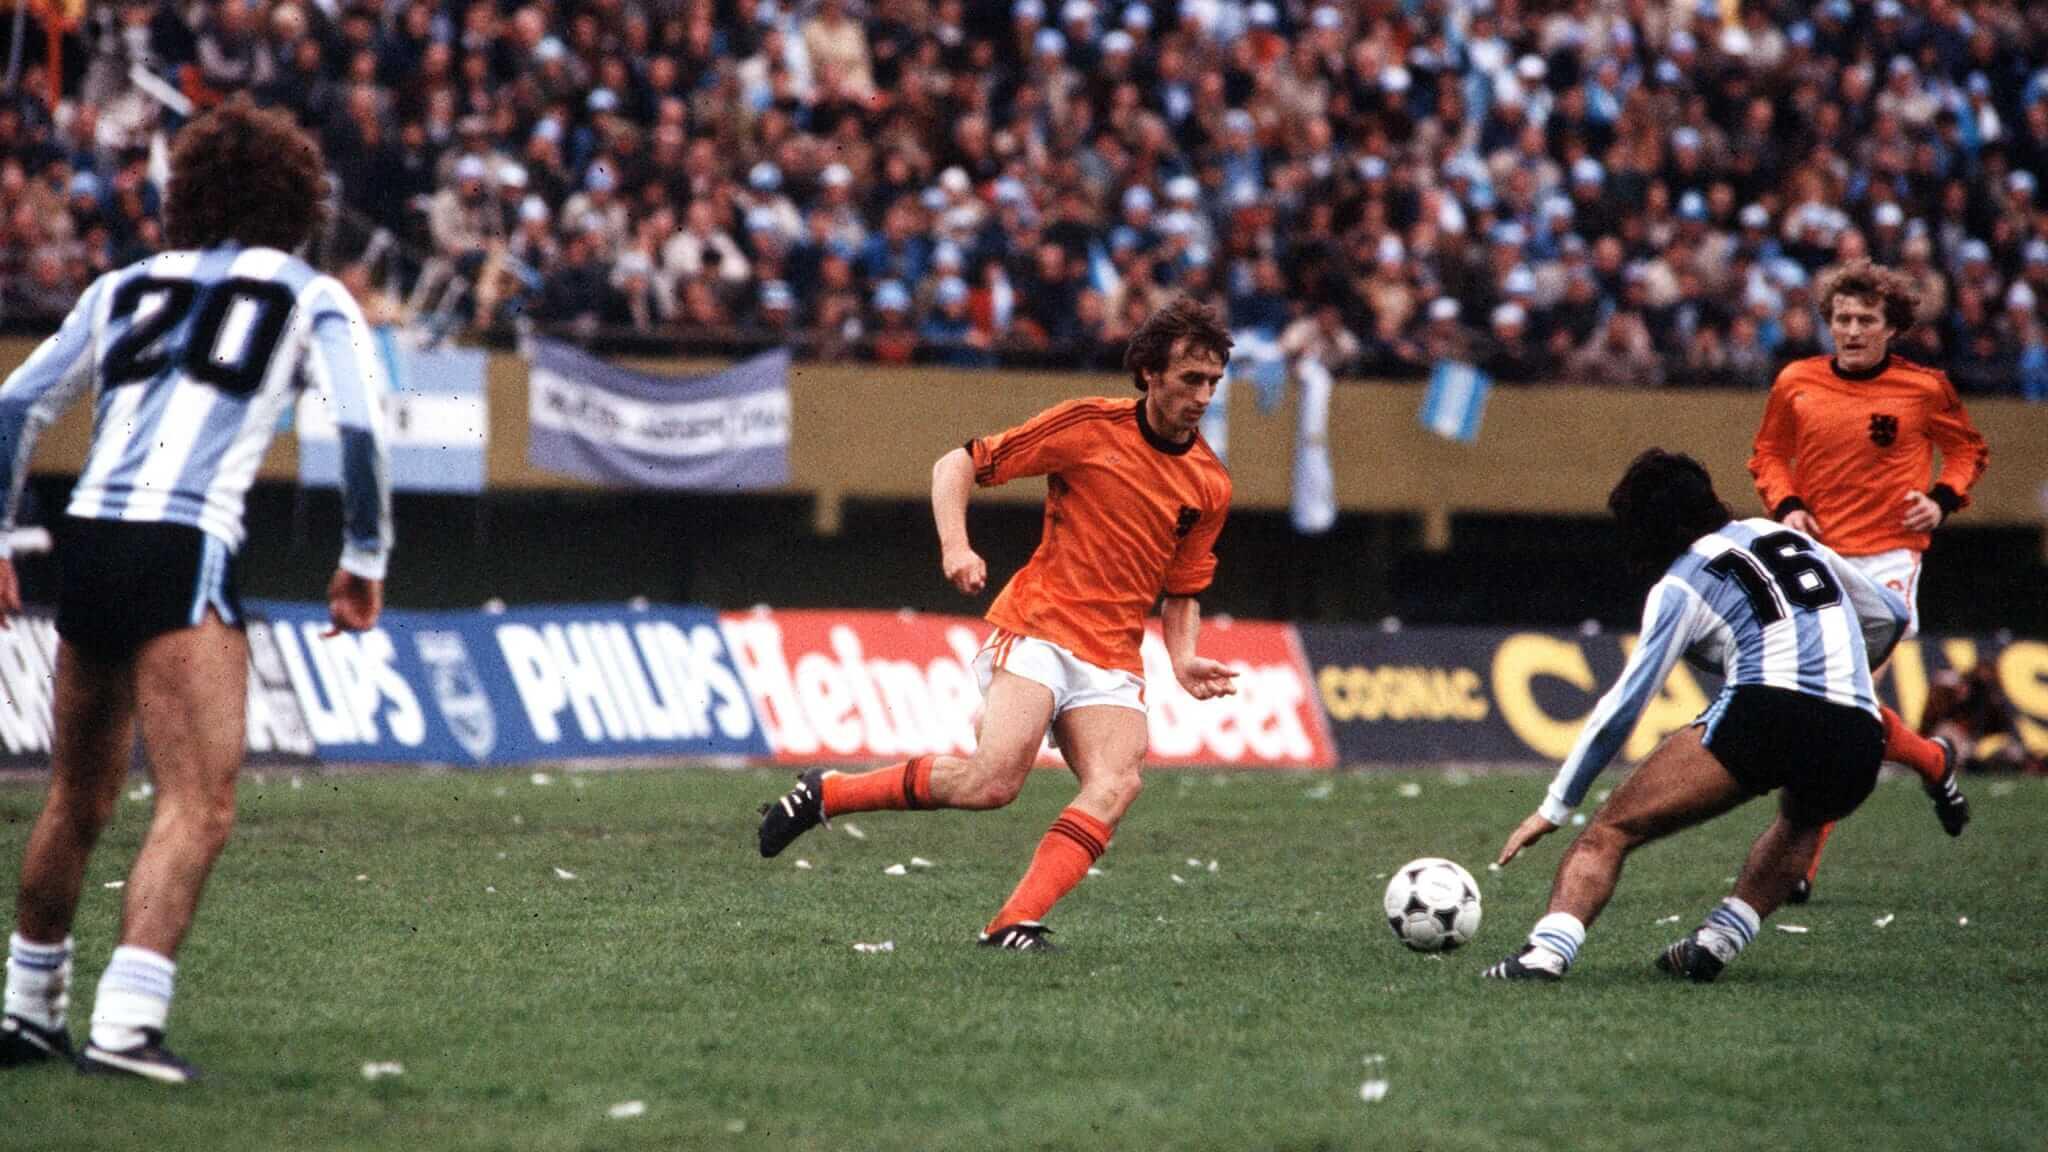 Финал чемпионата мира 1978 года